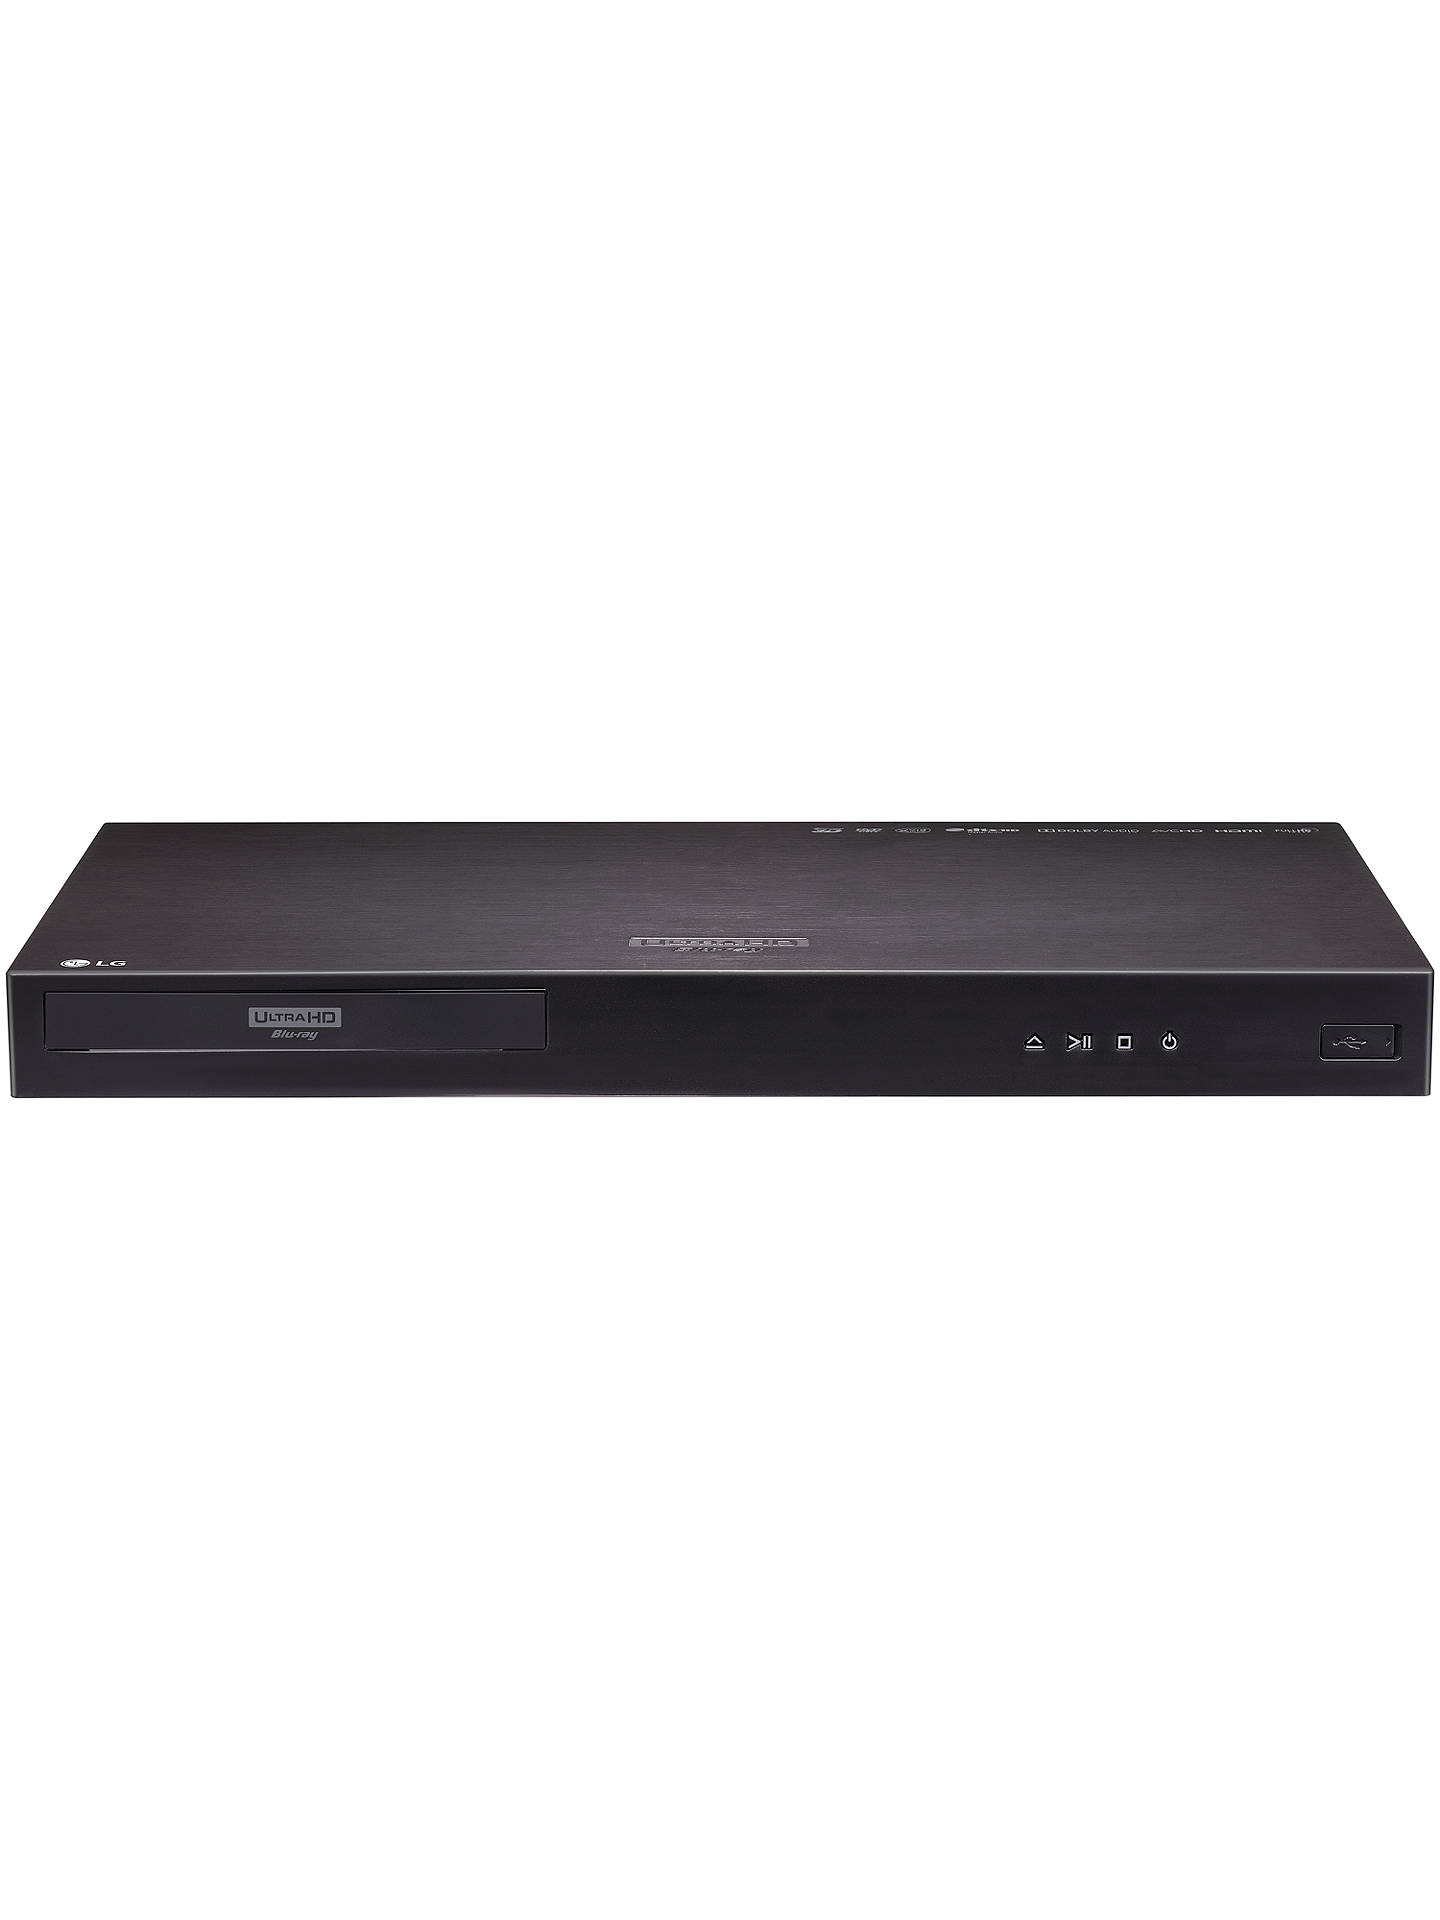 Lg Up970 Smart 3d 4k Uhd Hdr Blu Raydvd Player At John Lewis Partners